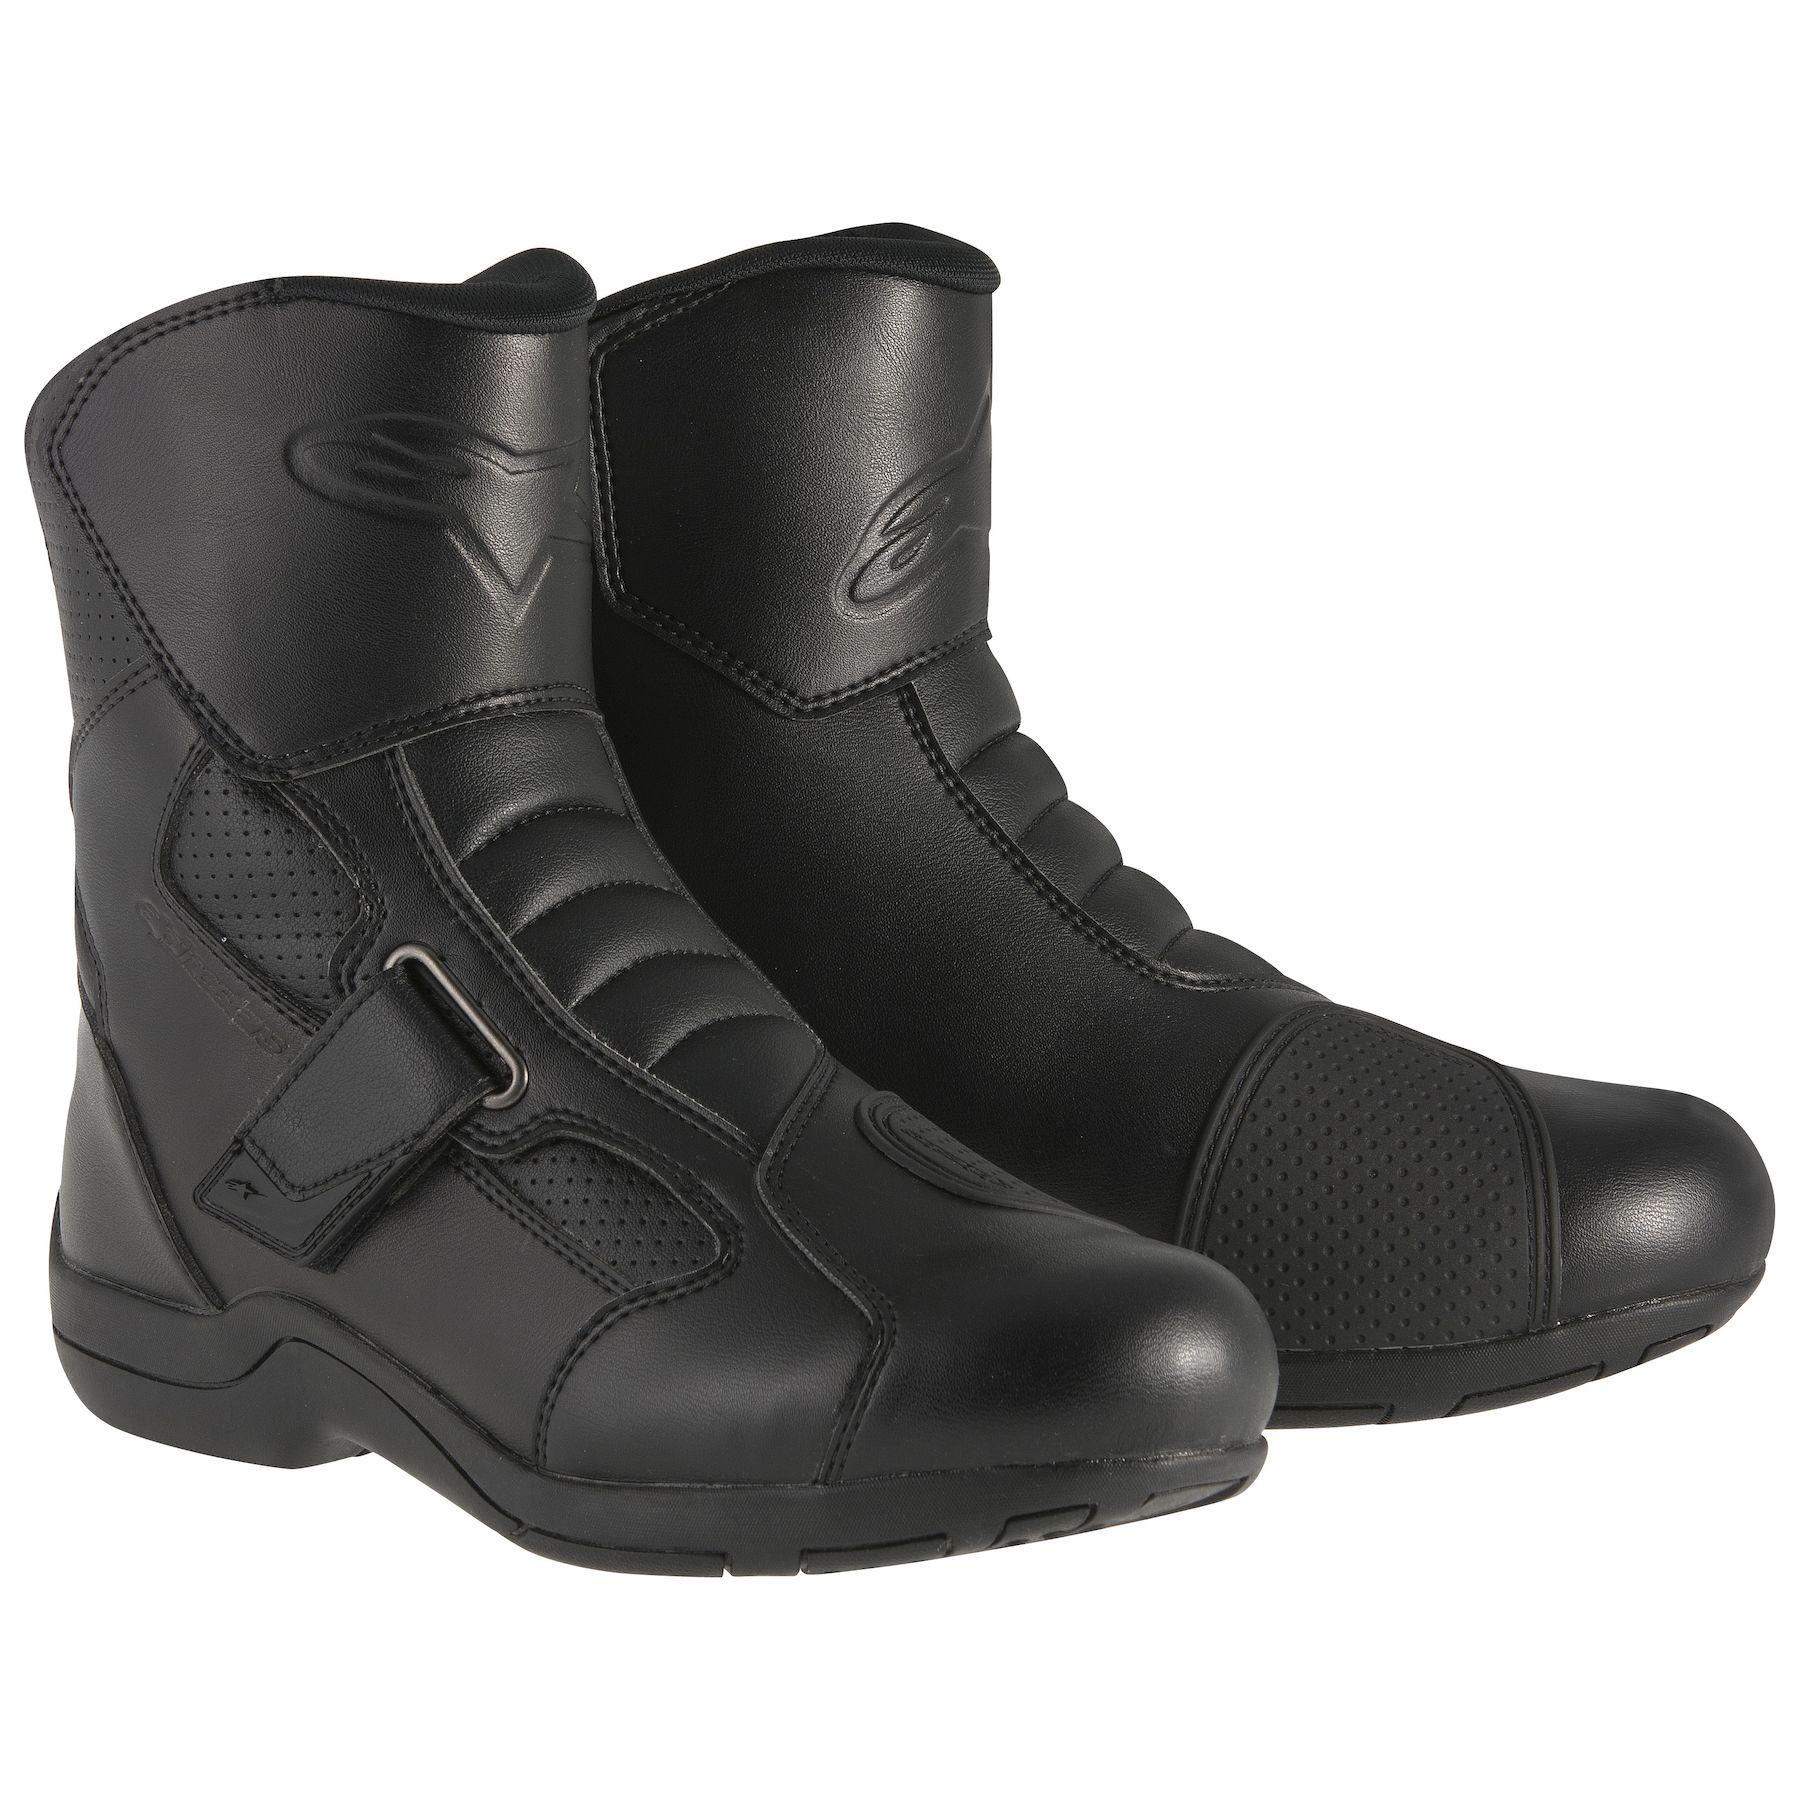 8 US 39 Euro//Black Alpinestars Womens Stella Valencia Waterproof Boots